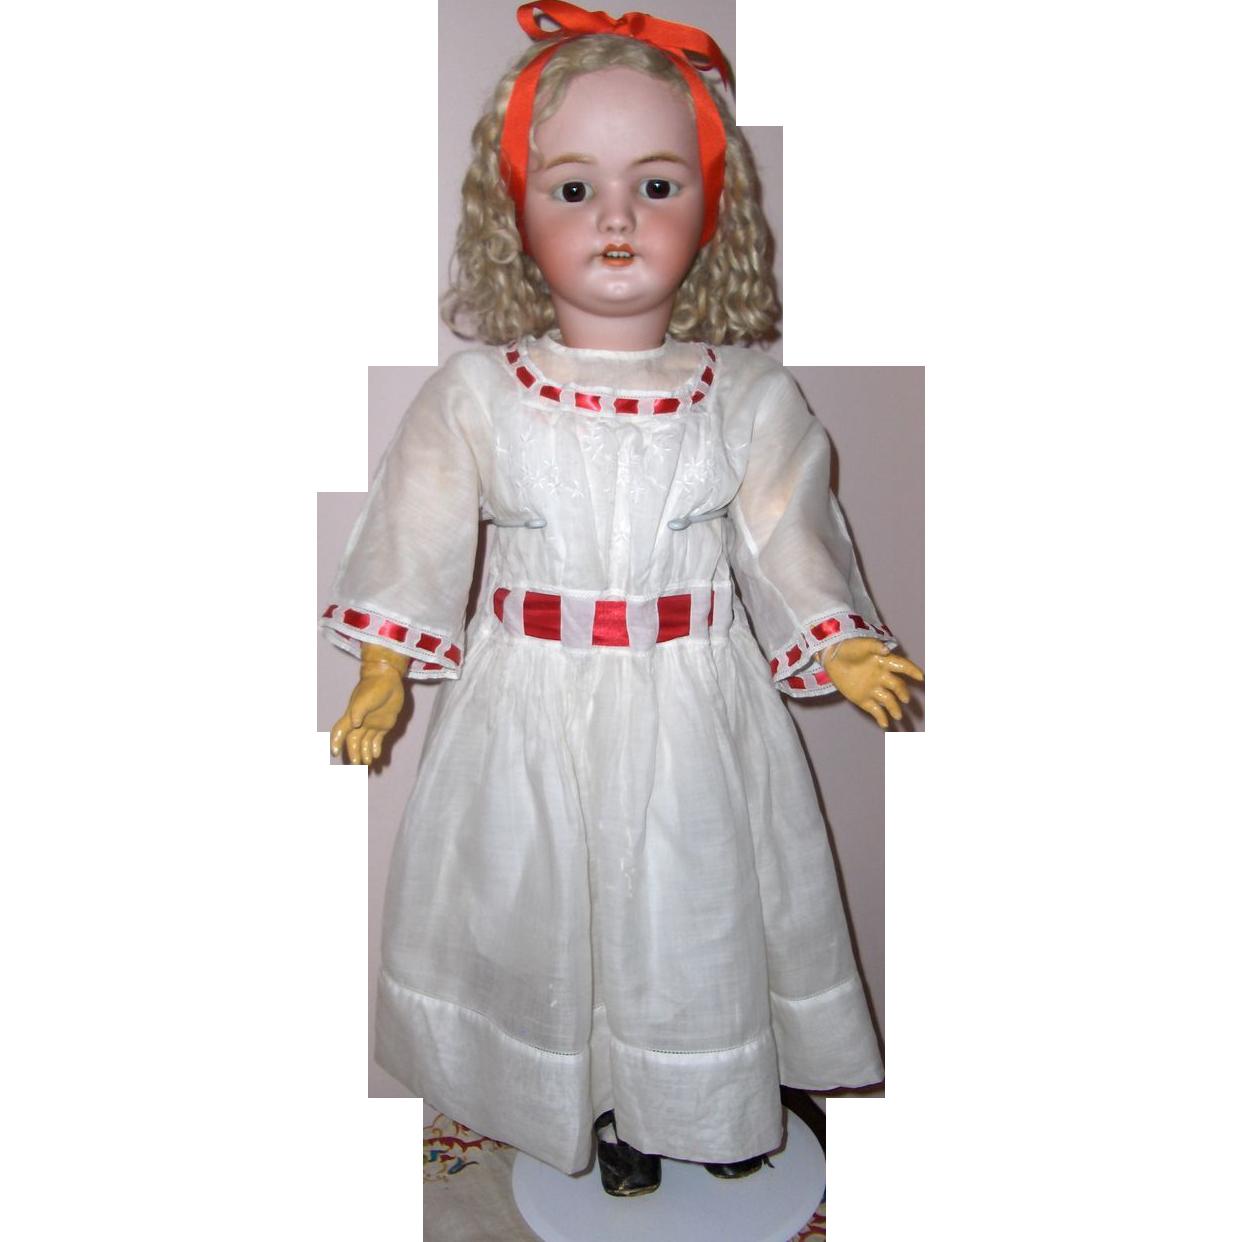 32in. Simon & Halbig #1079 German Bisque Antique Doll Fabulous Original Wig